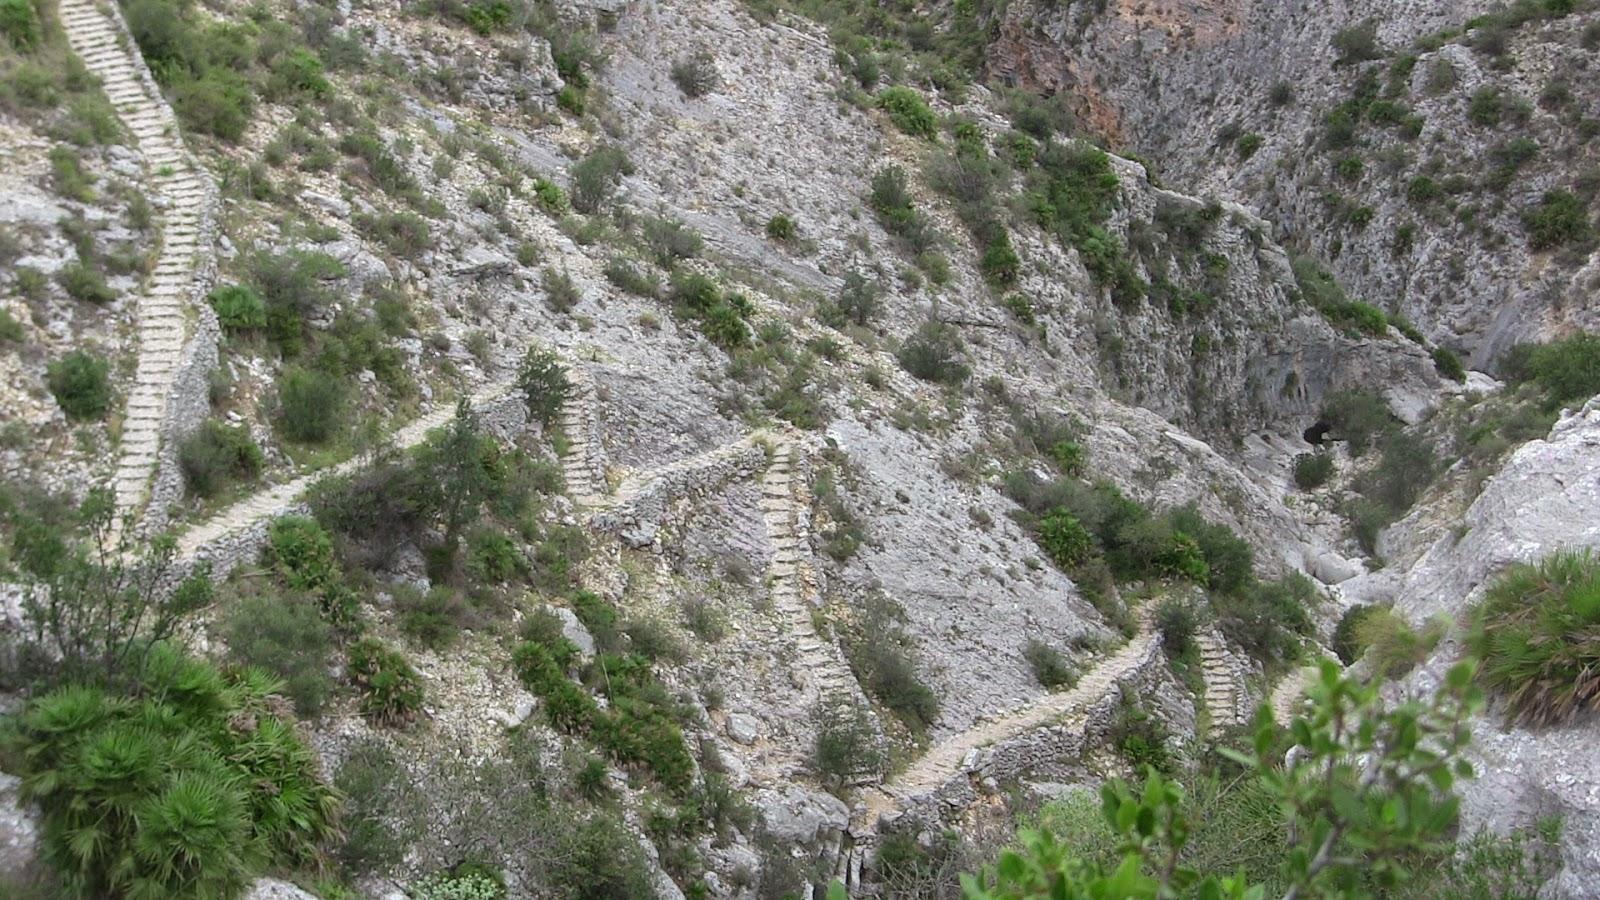 Fuente: mochileropelatus.blogspot.com